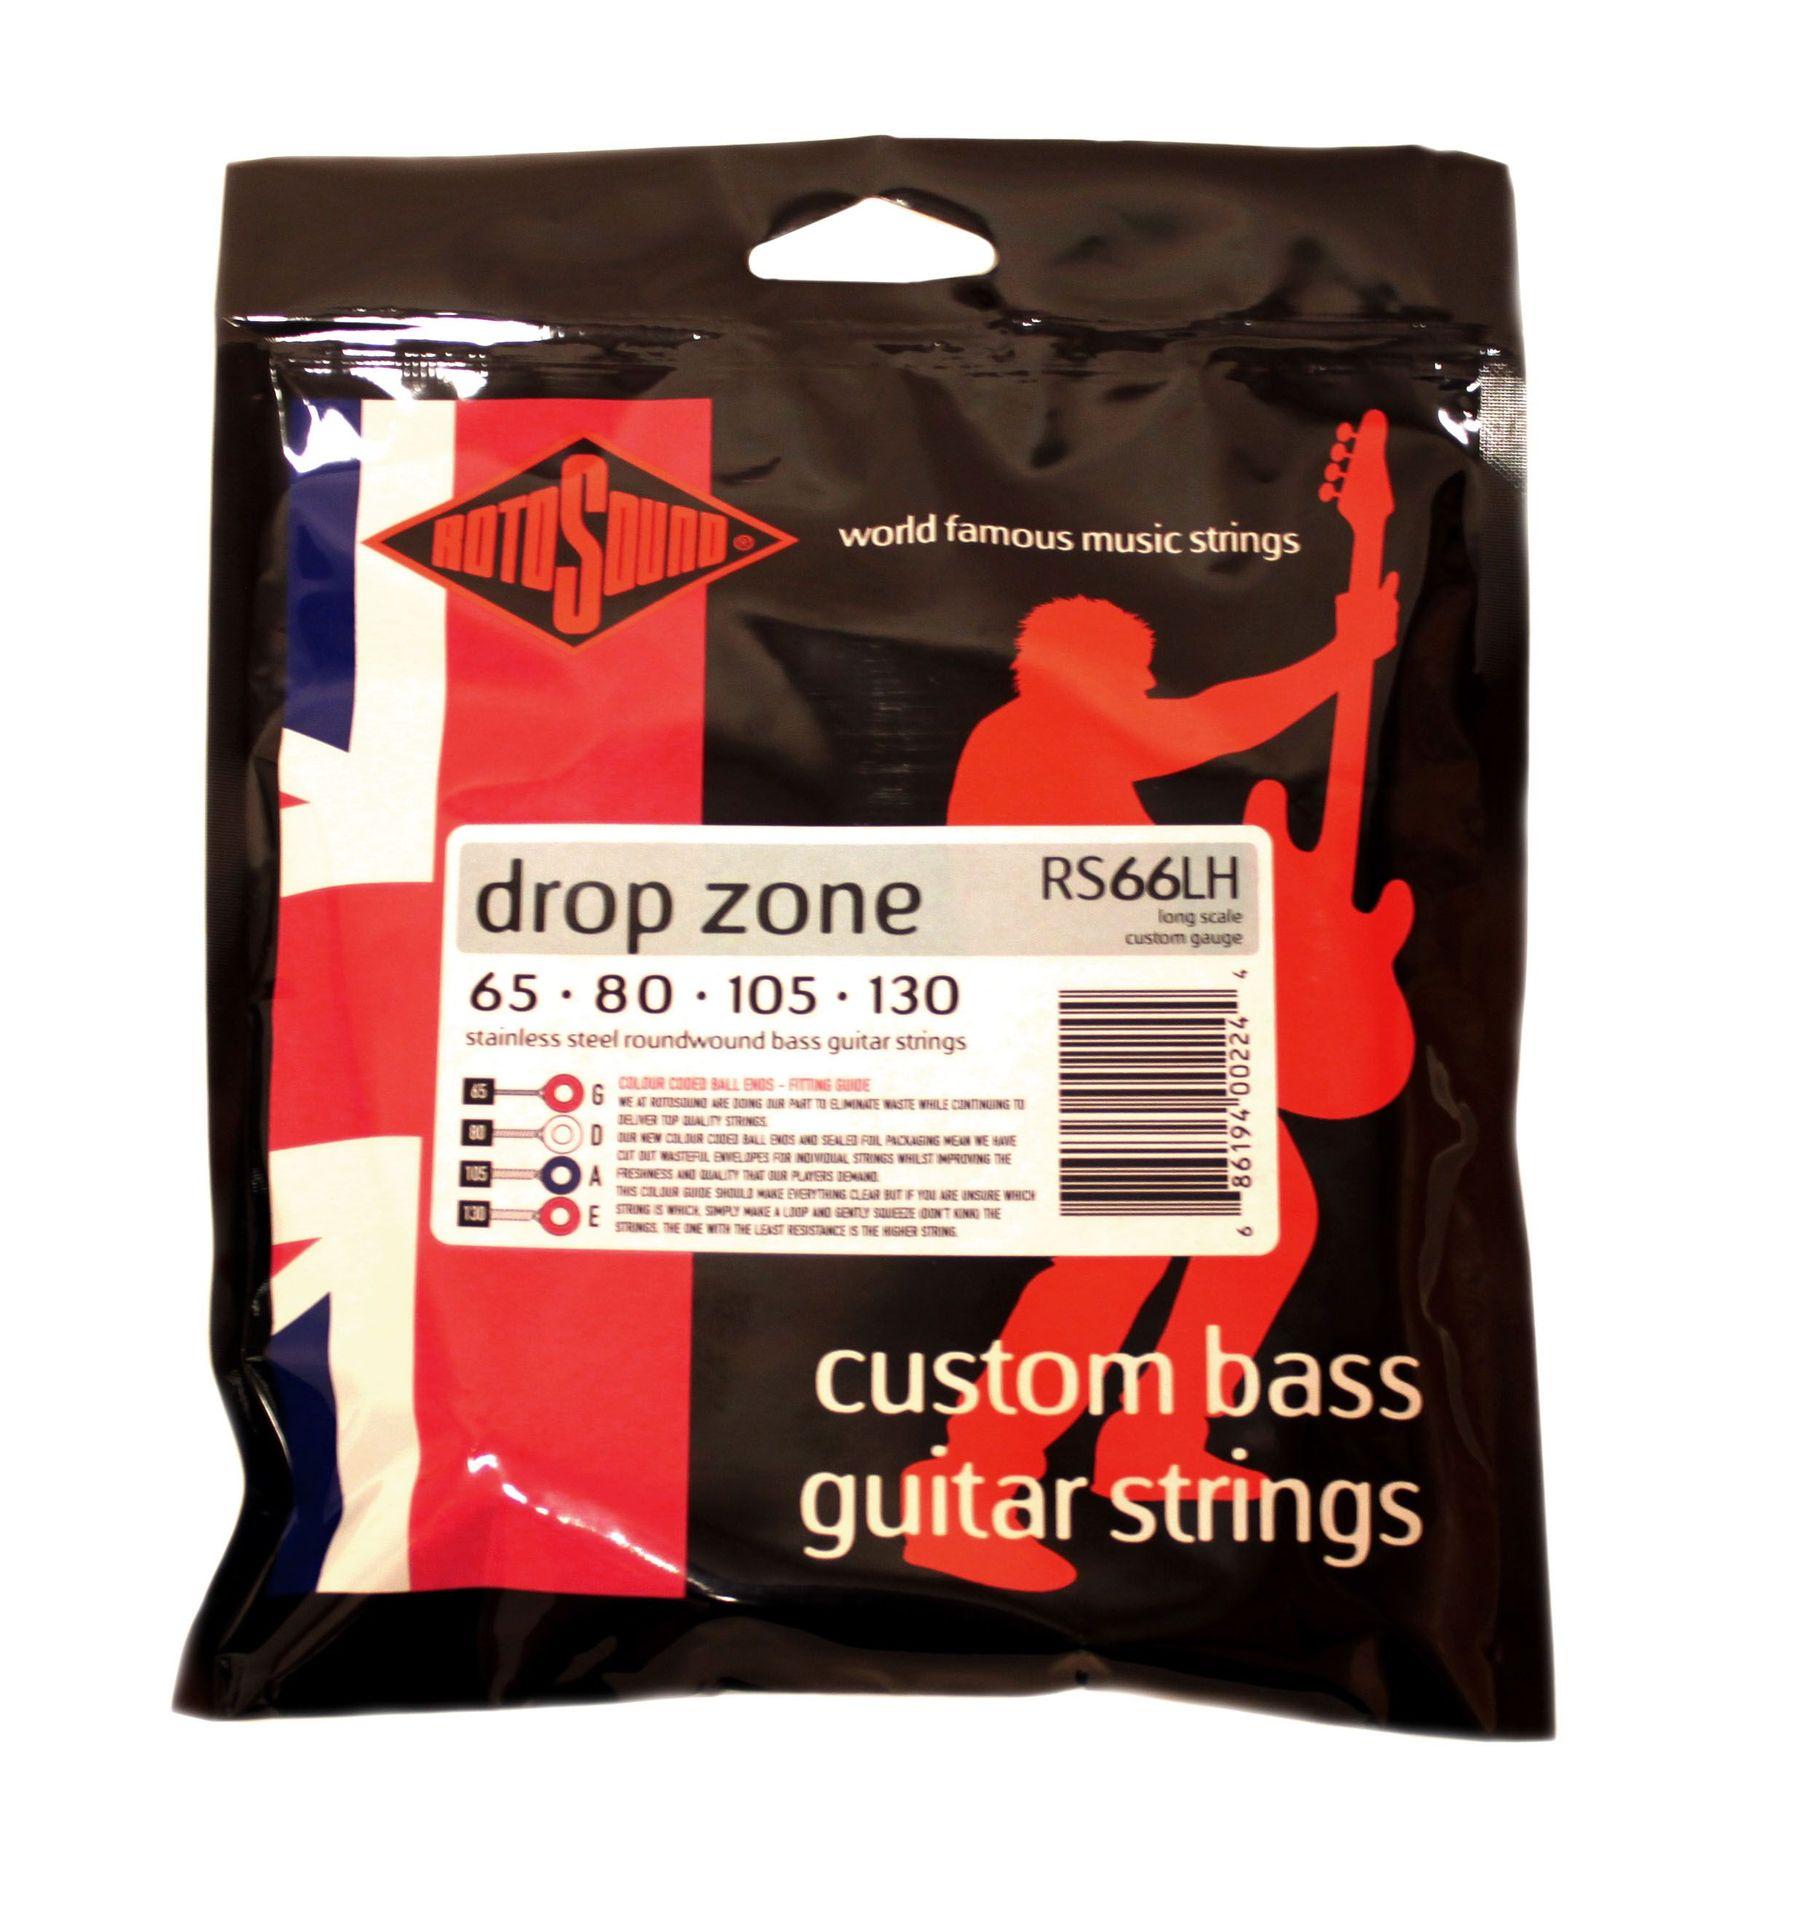 Rotosound RS 66 LH Drop Zone E-Bass Saiten 65-130  RORS66LH